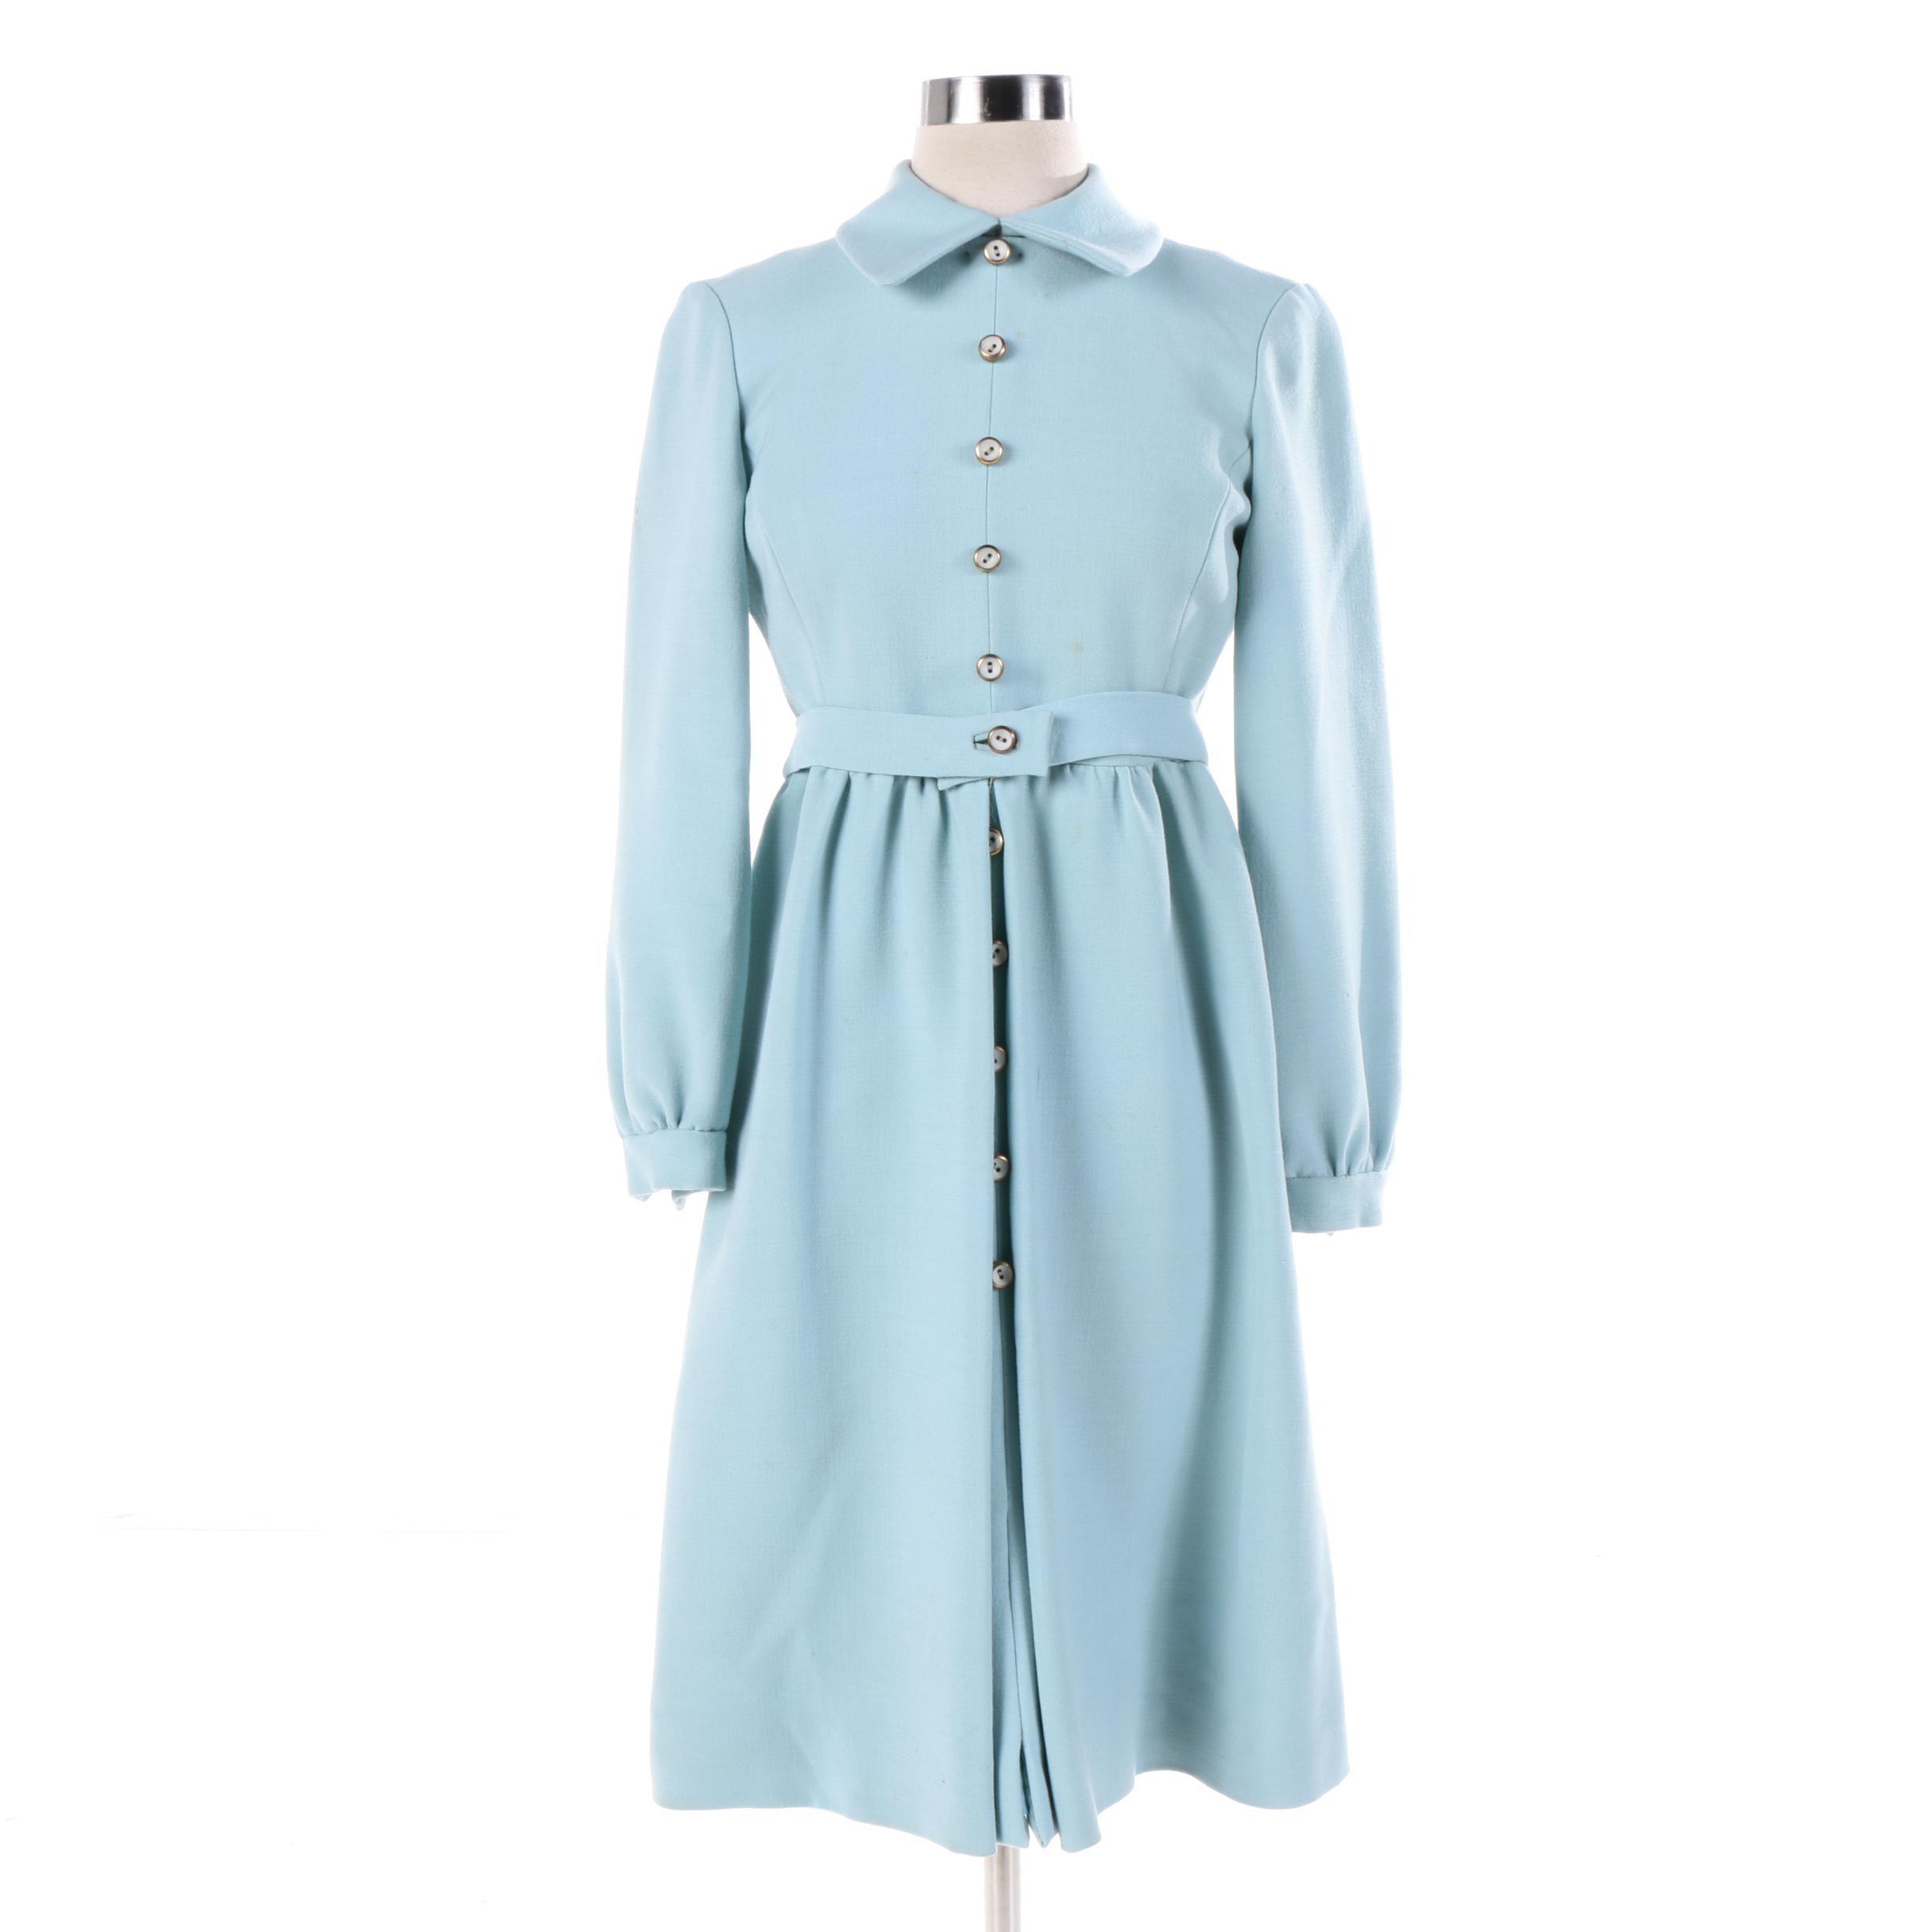 Circa 1960s Vintage Blue Shirt Dress